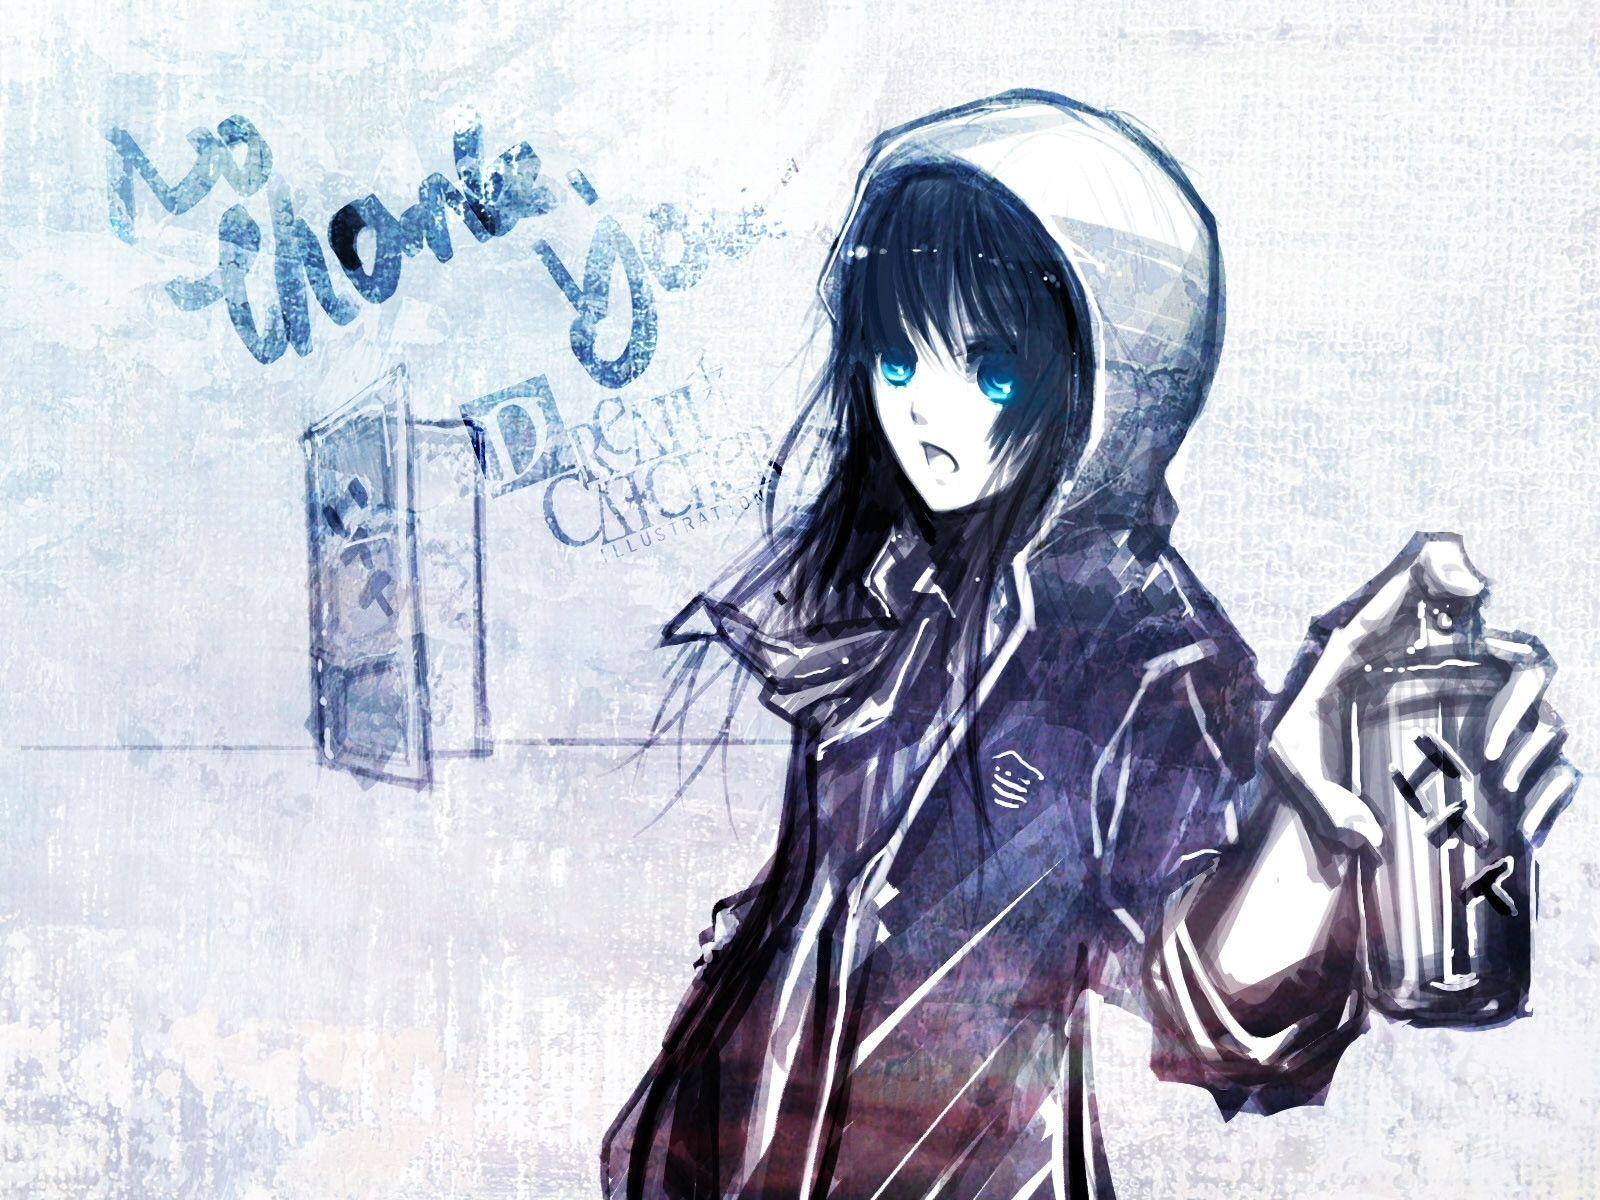 Emo anime boy wallpapers wallpaper cave - Emo scene wallpaper ...